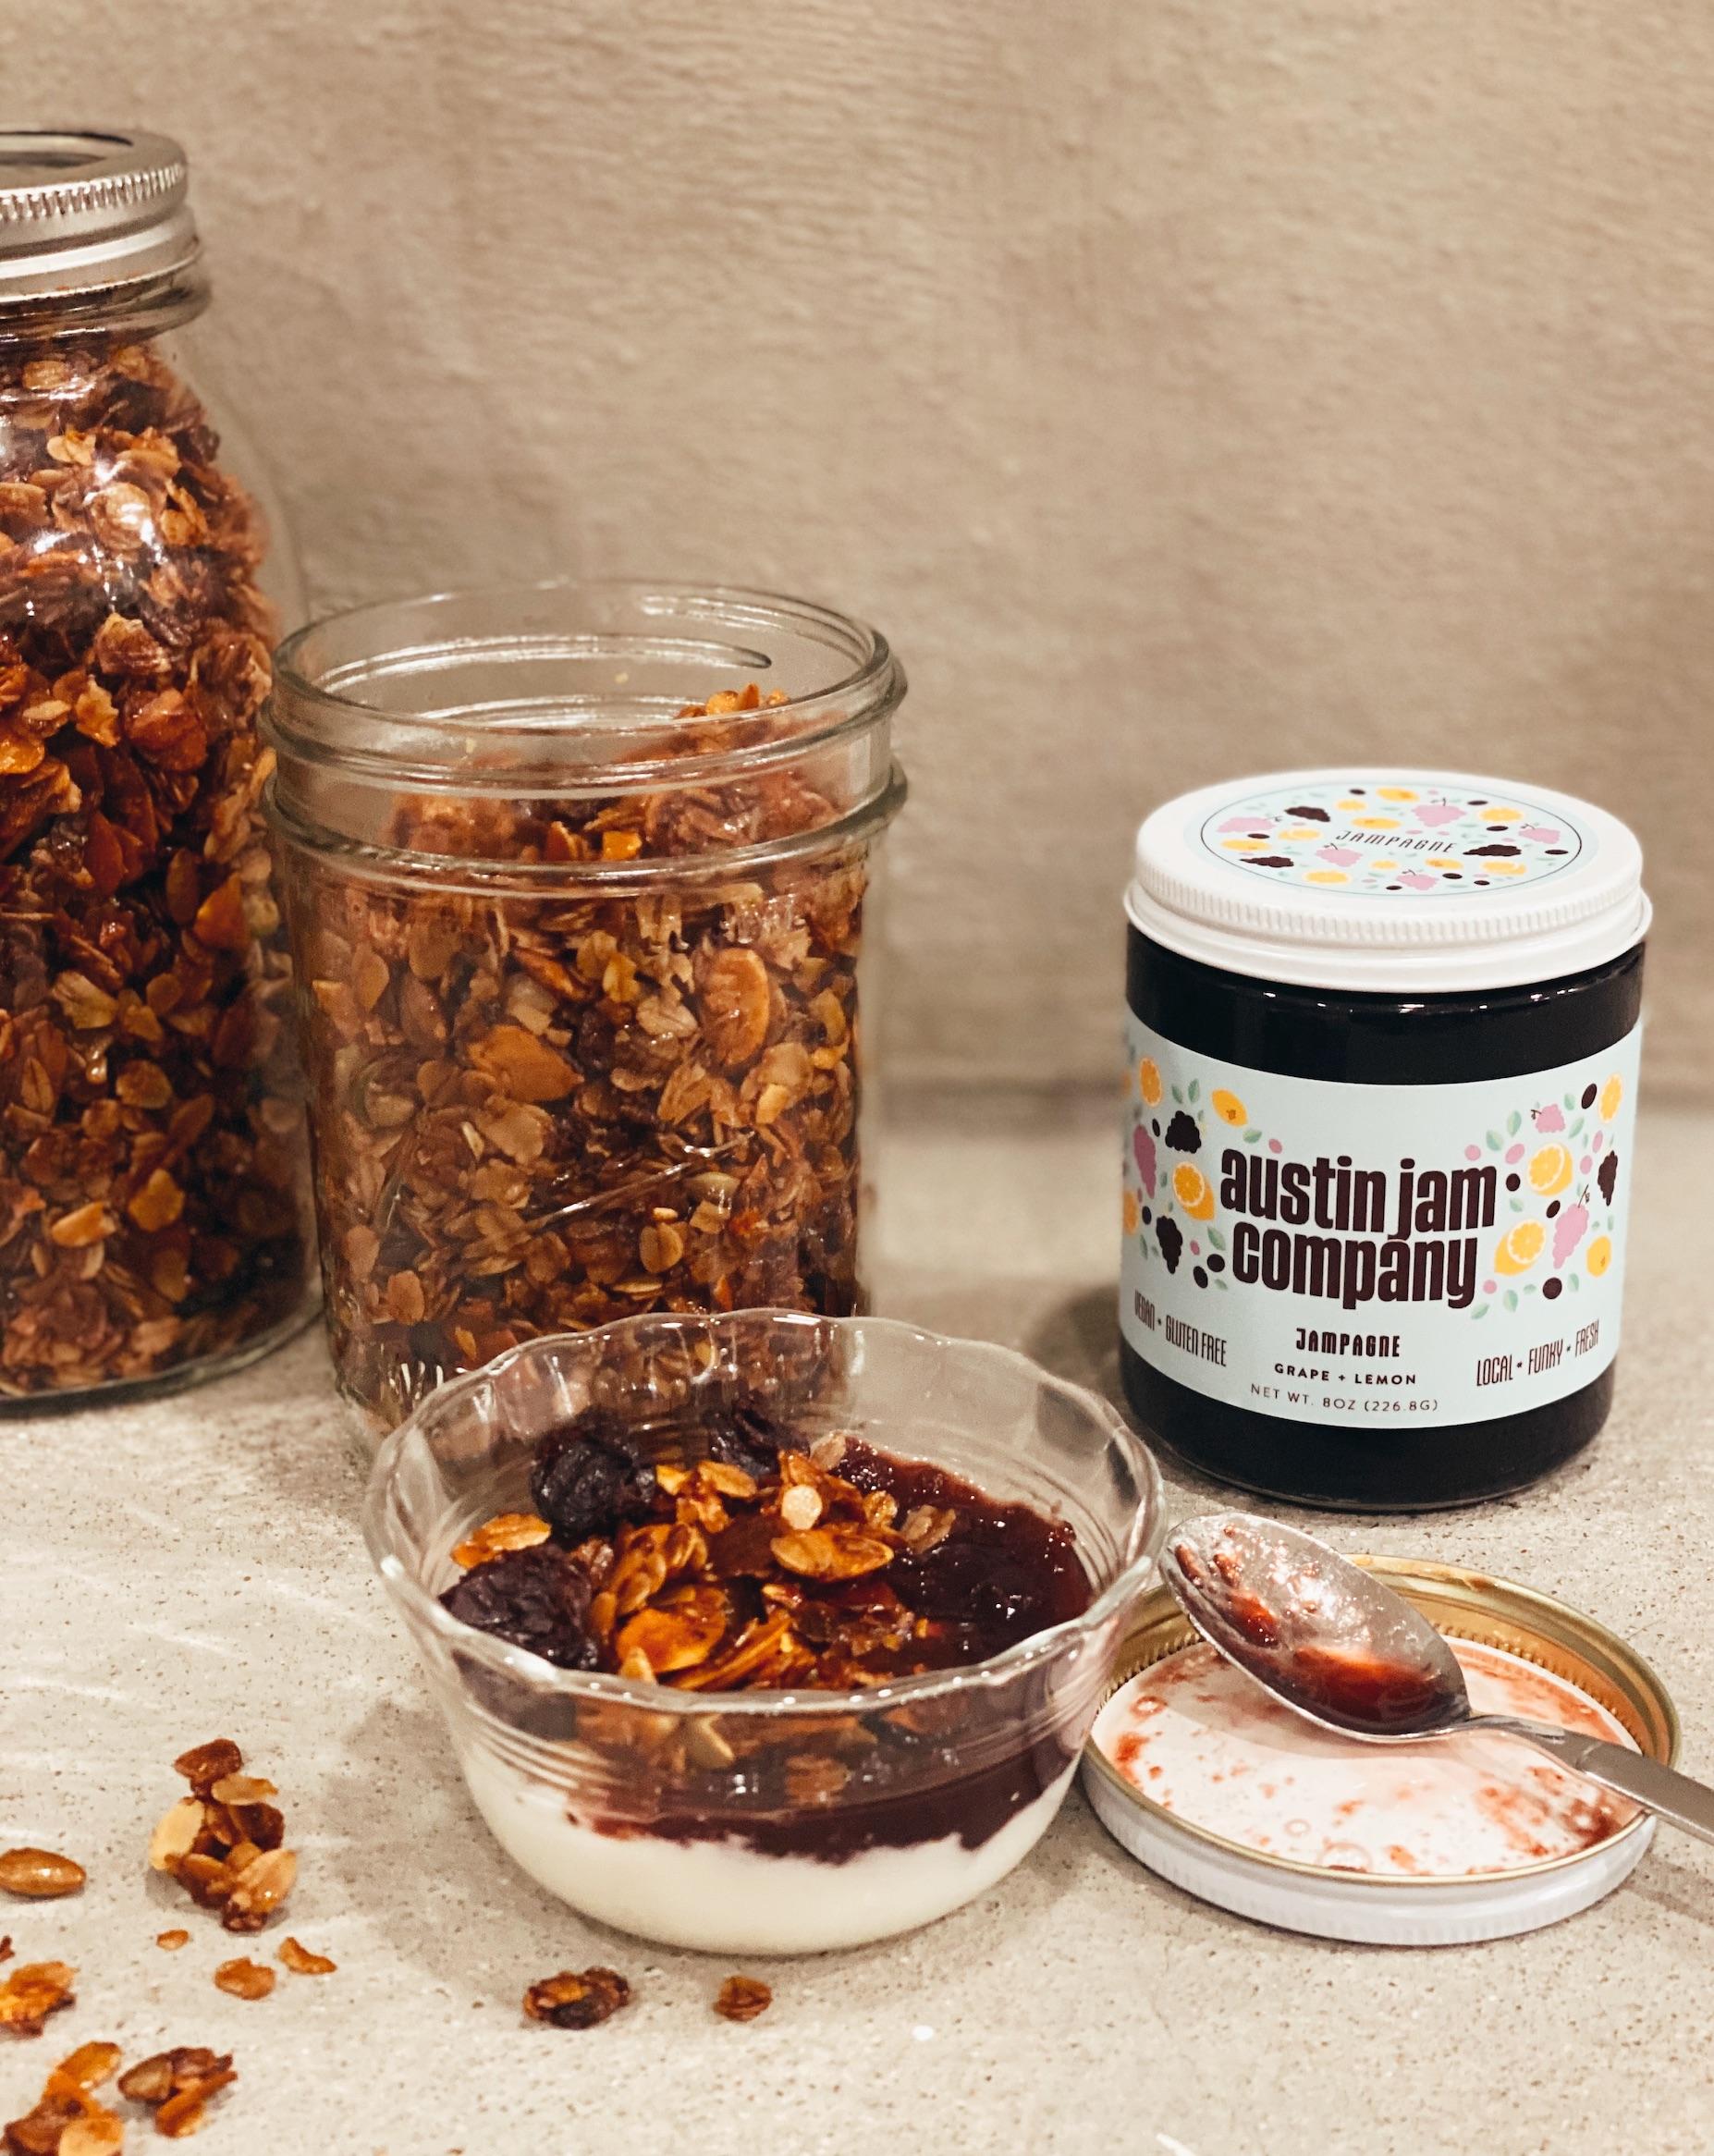 Salted Maple Granola and Jam Parfait